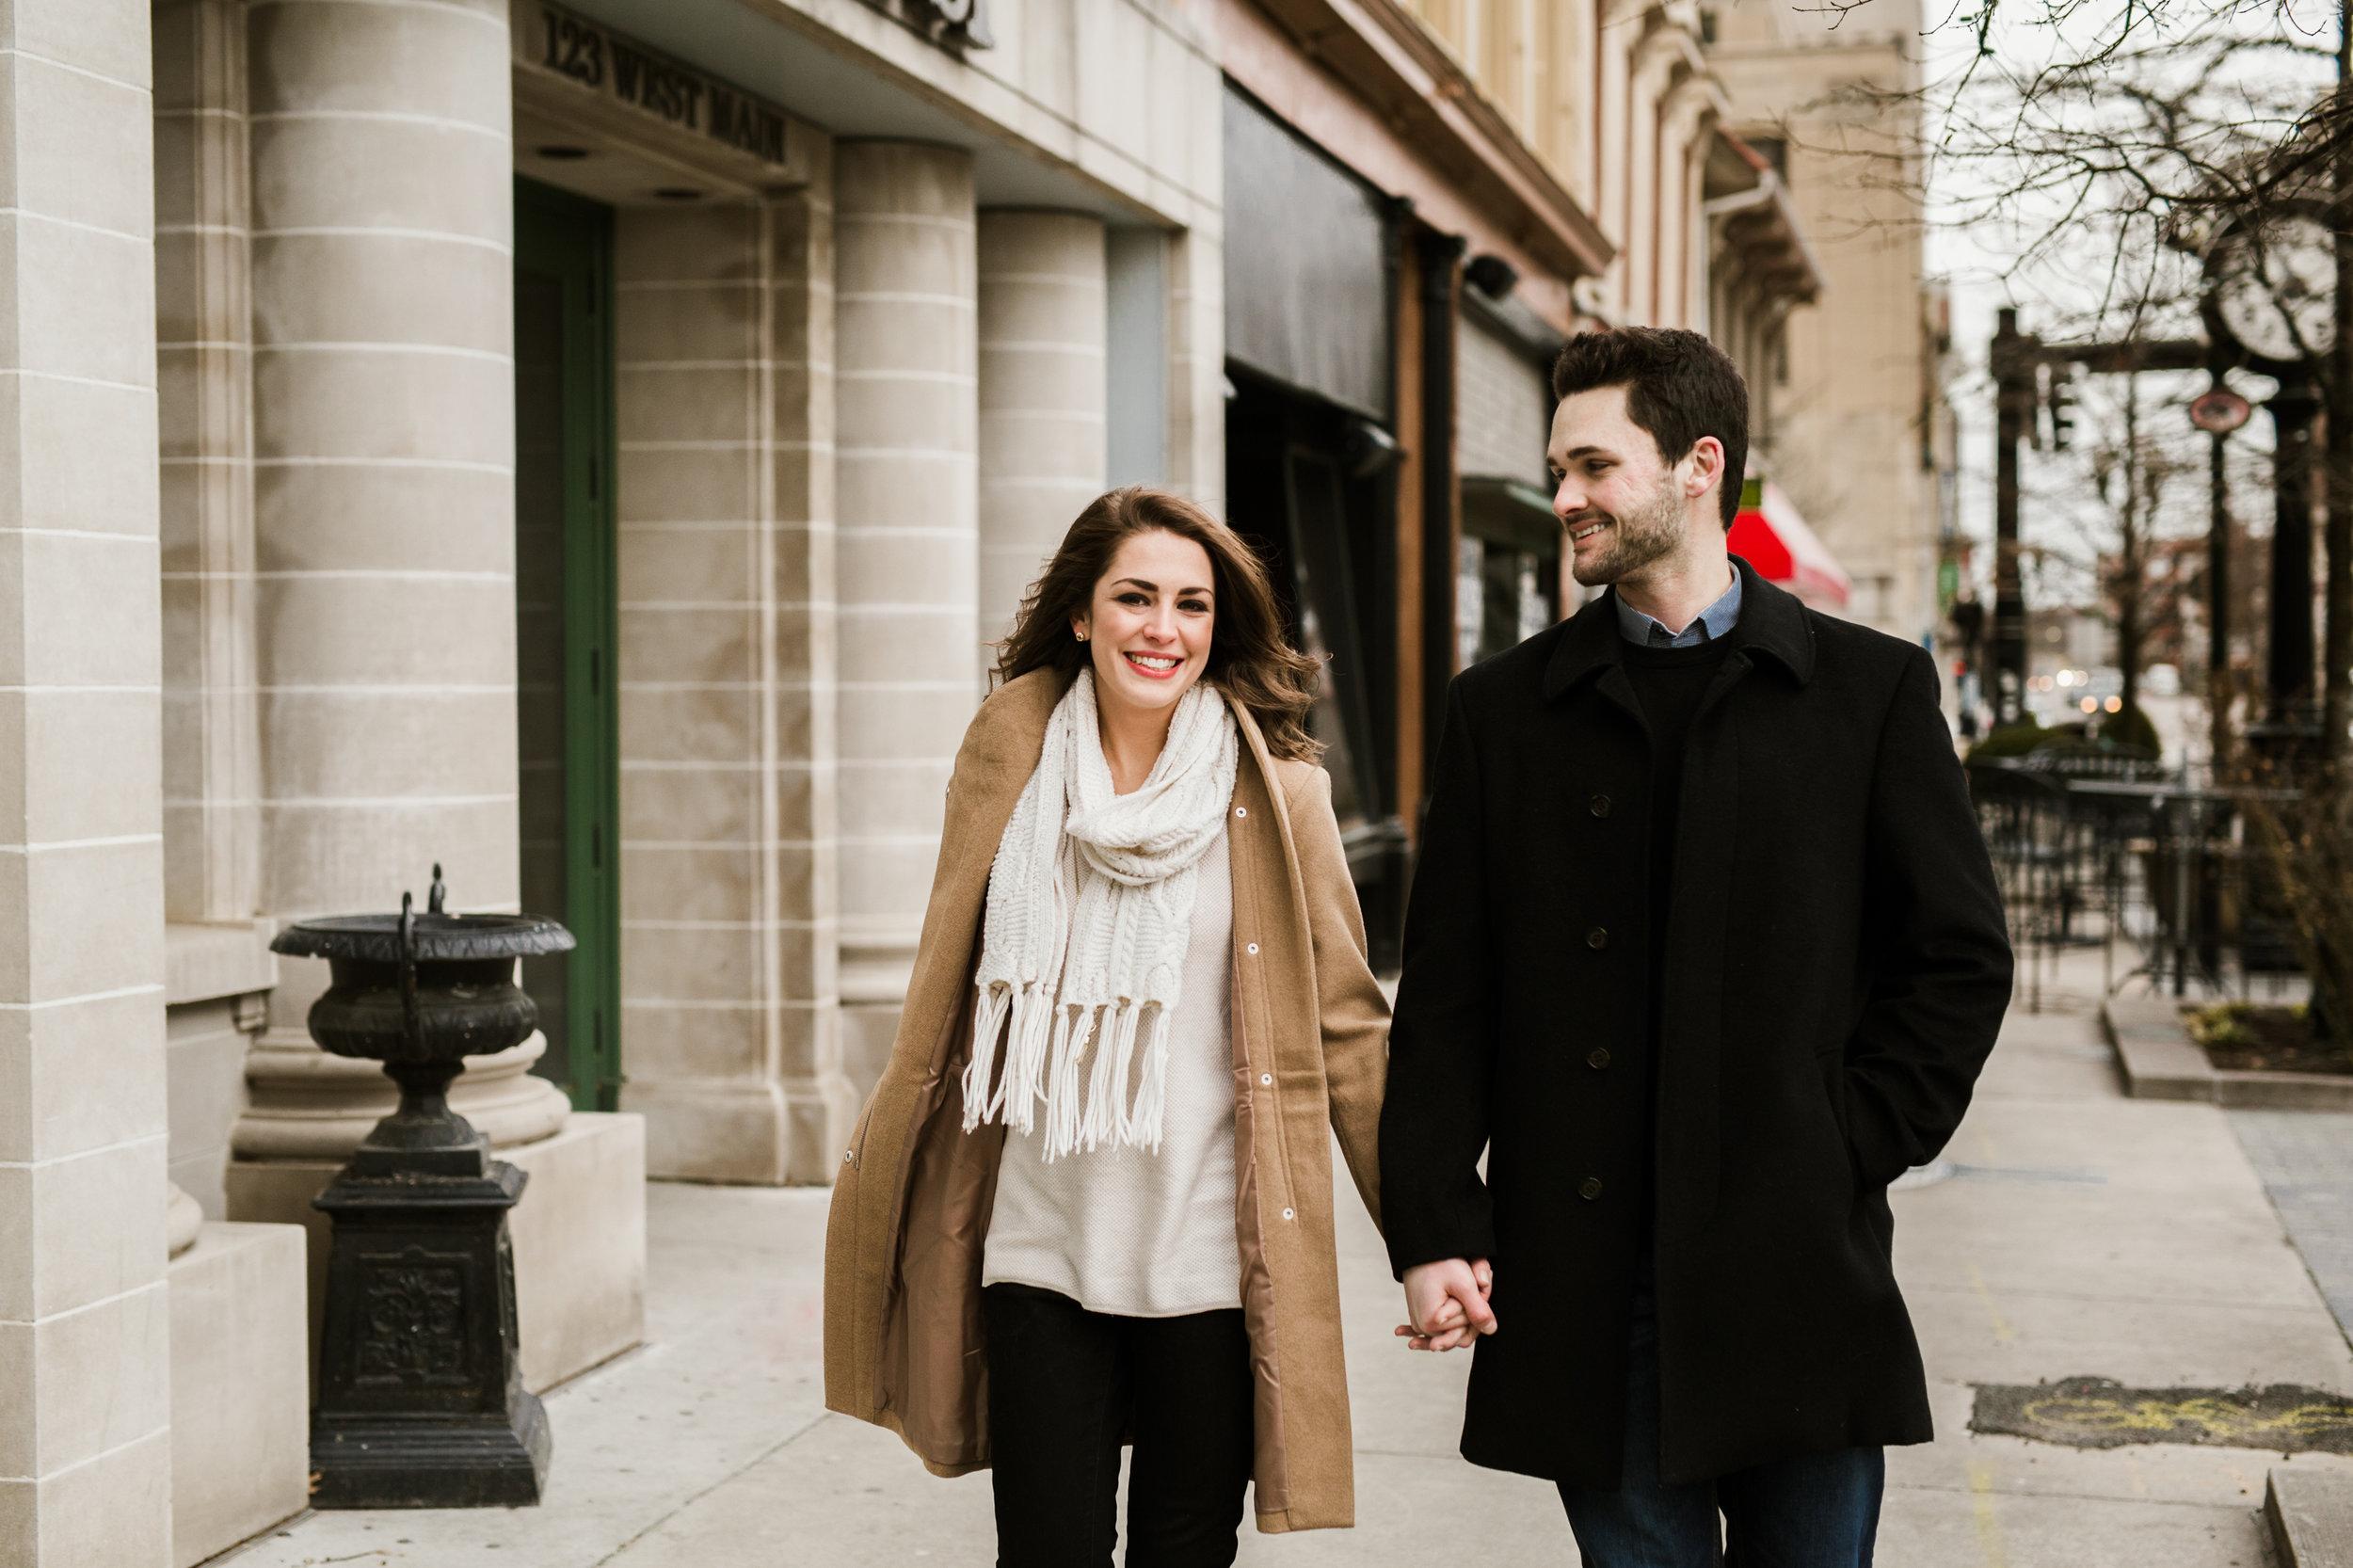 Ellen & Lee Engagement 2018 WEBSITE SP Crystal Ludwick Photo (43 of 54).jpg